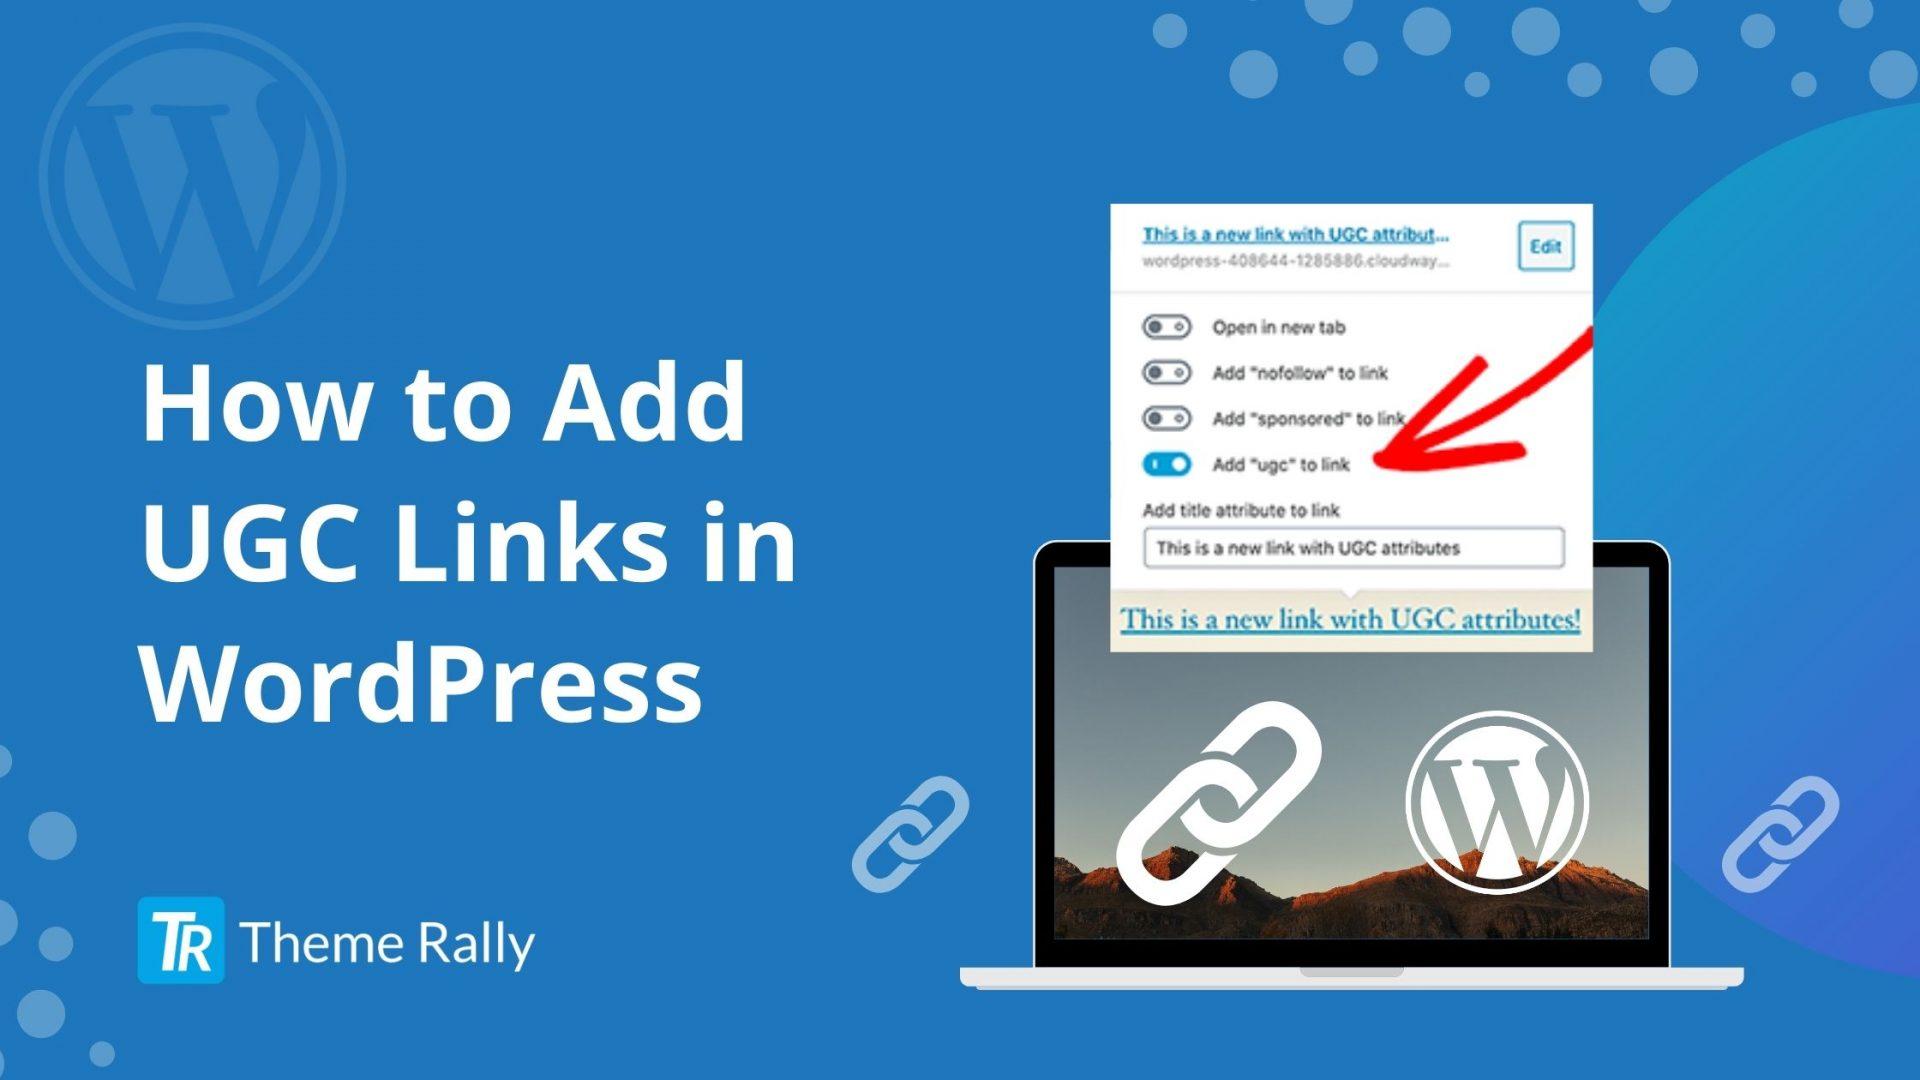 How to Add UGC Links in WordPress